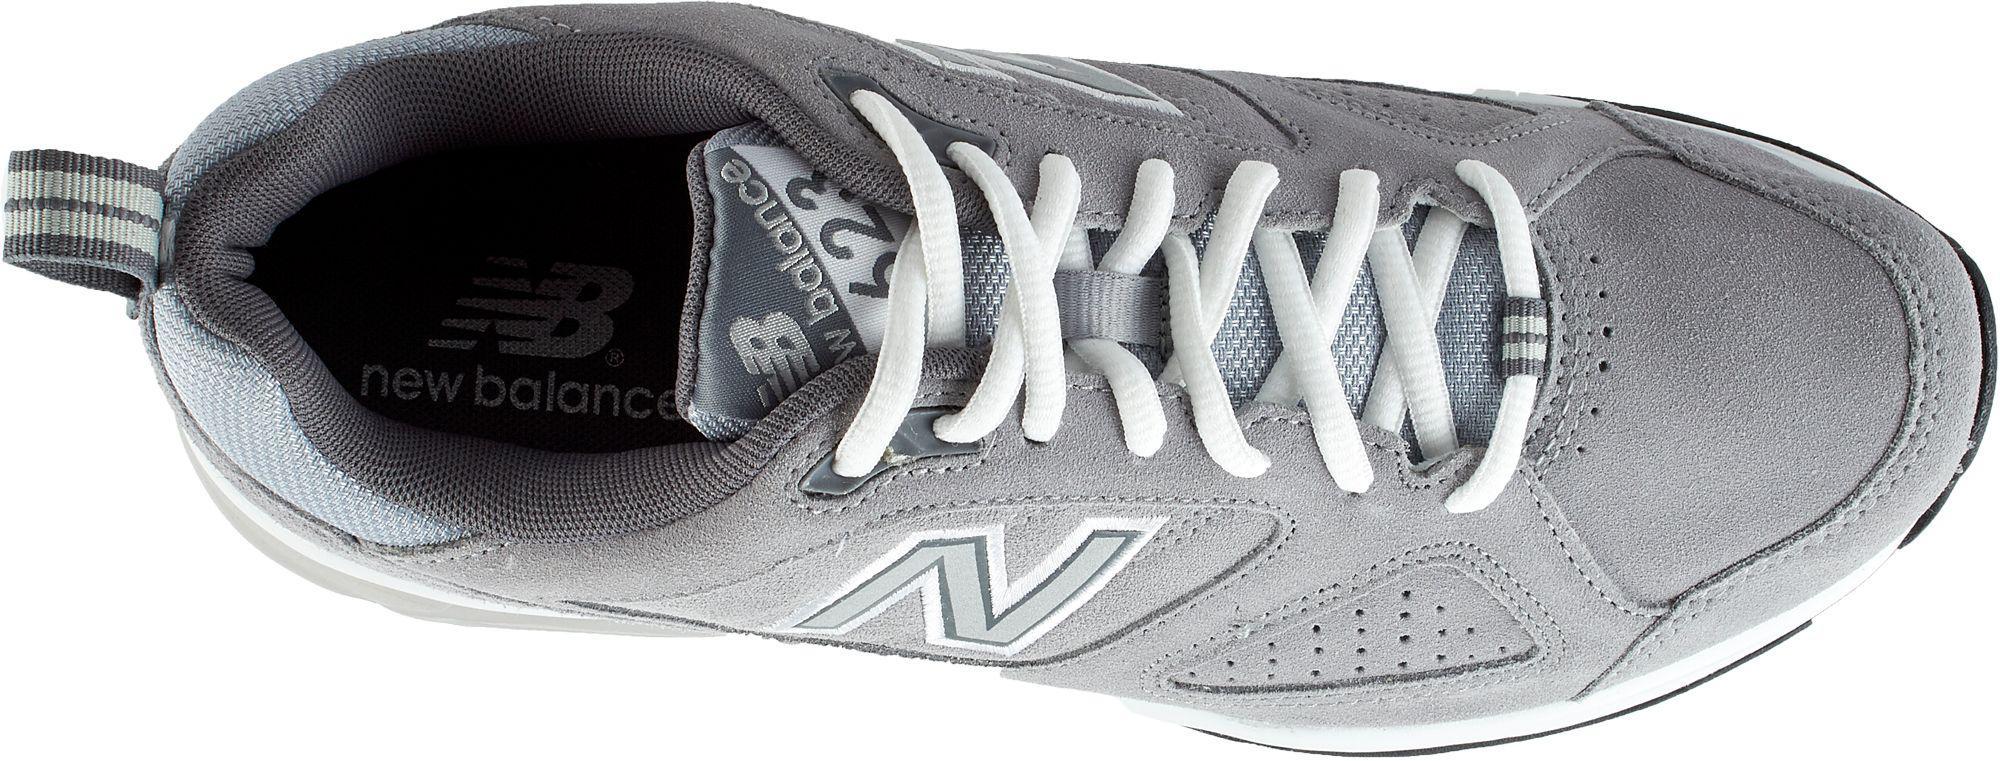 New Balance 623v3 Suede Training Shoes